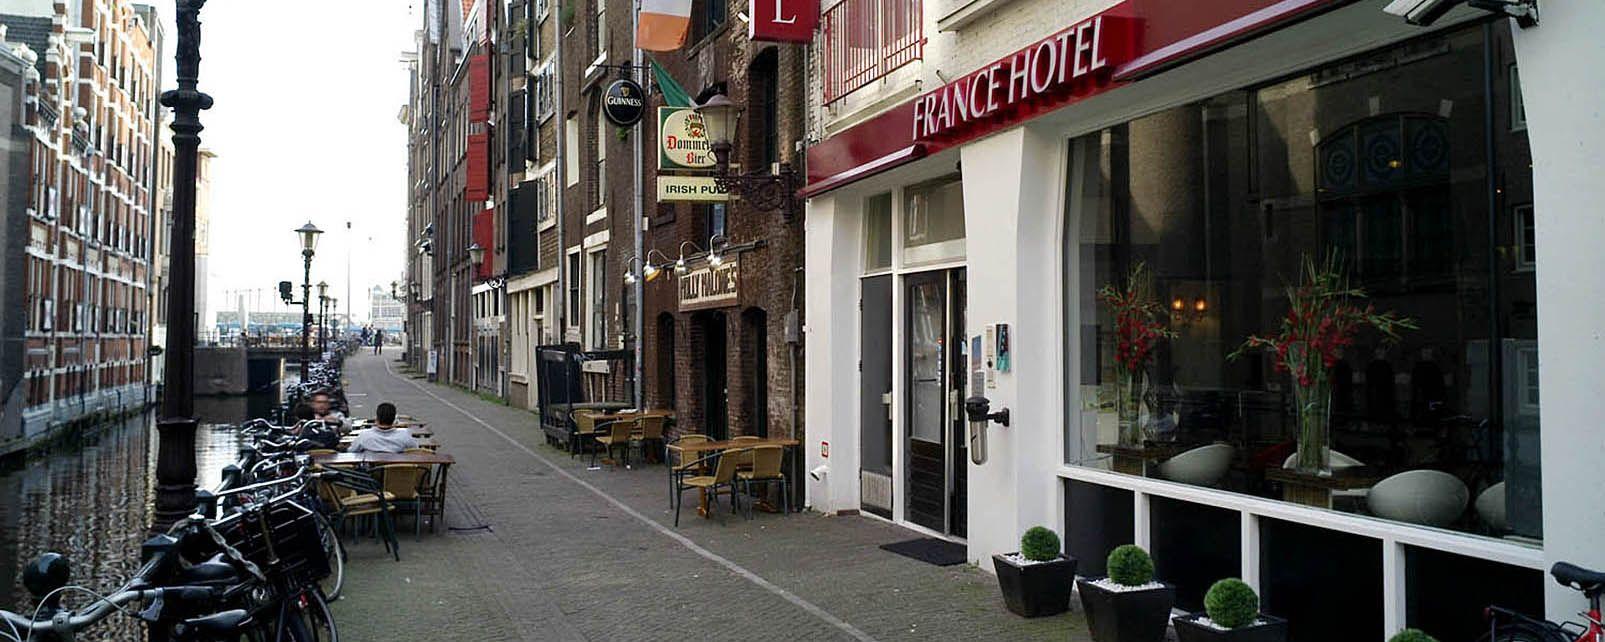 Hotel Floris France Amsterdam